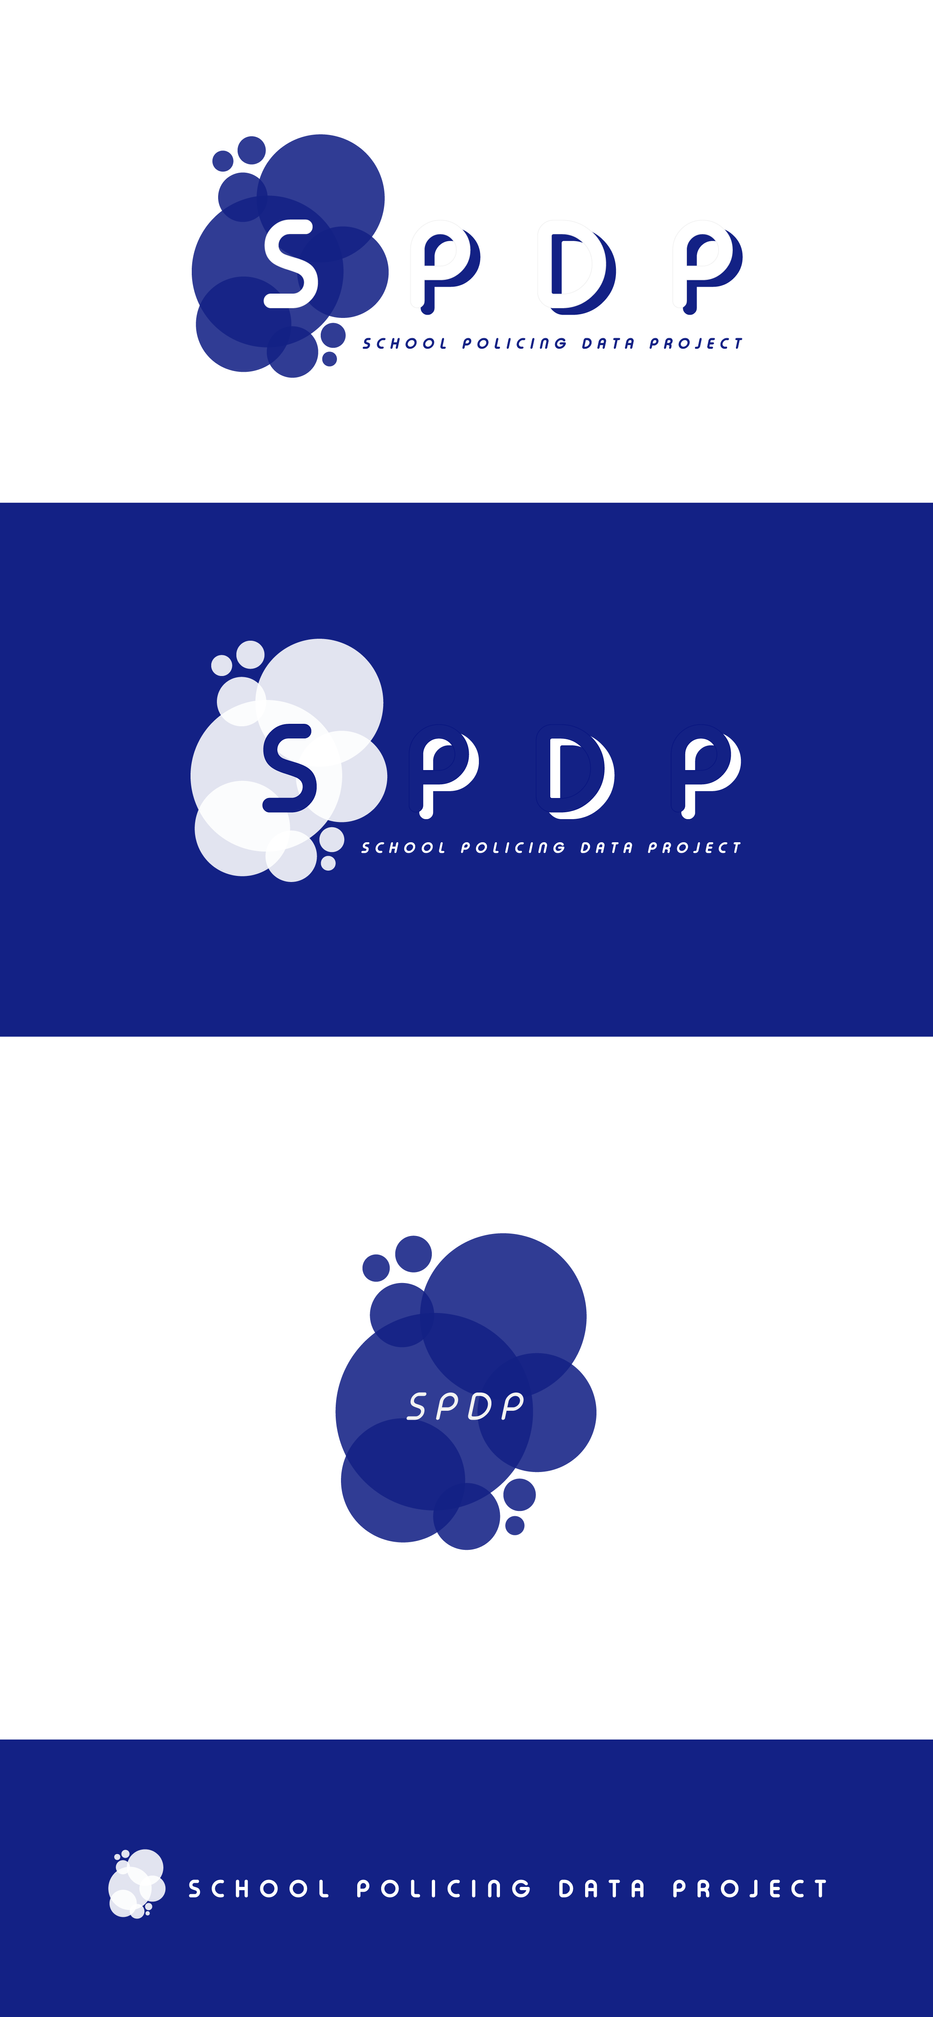 School Policing Data Project logos